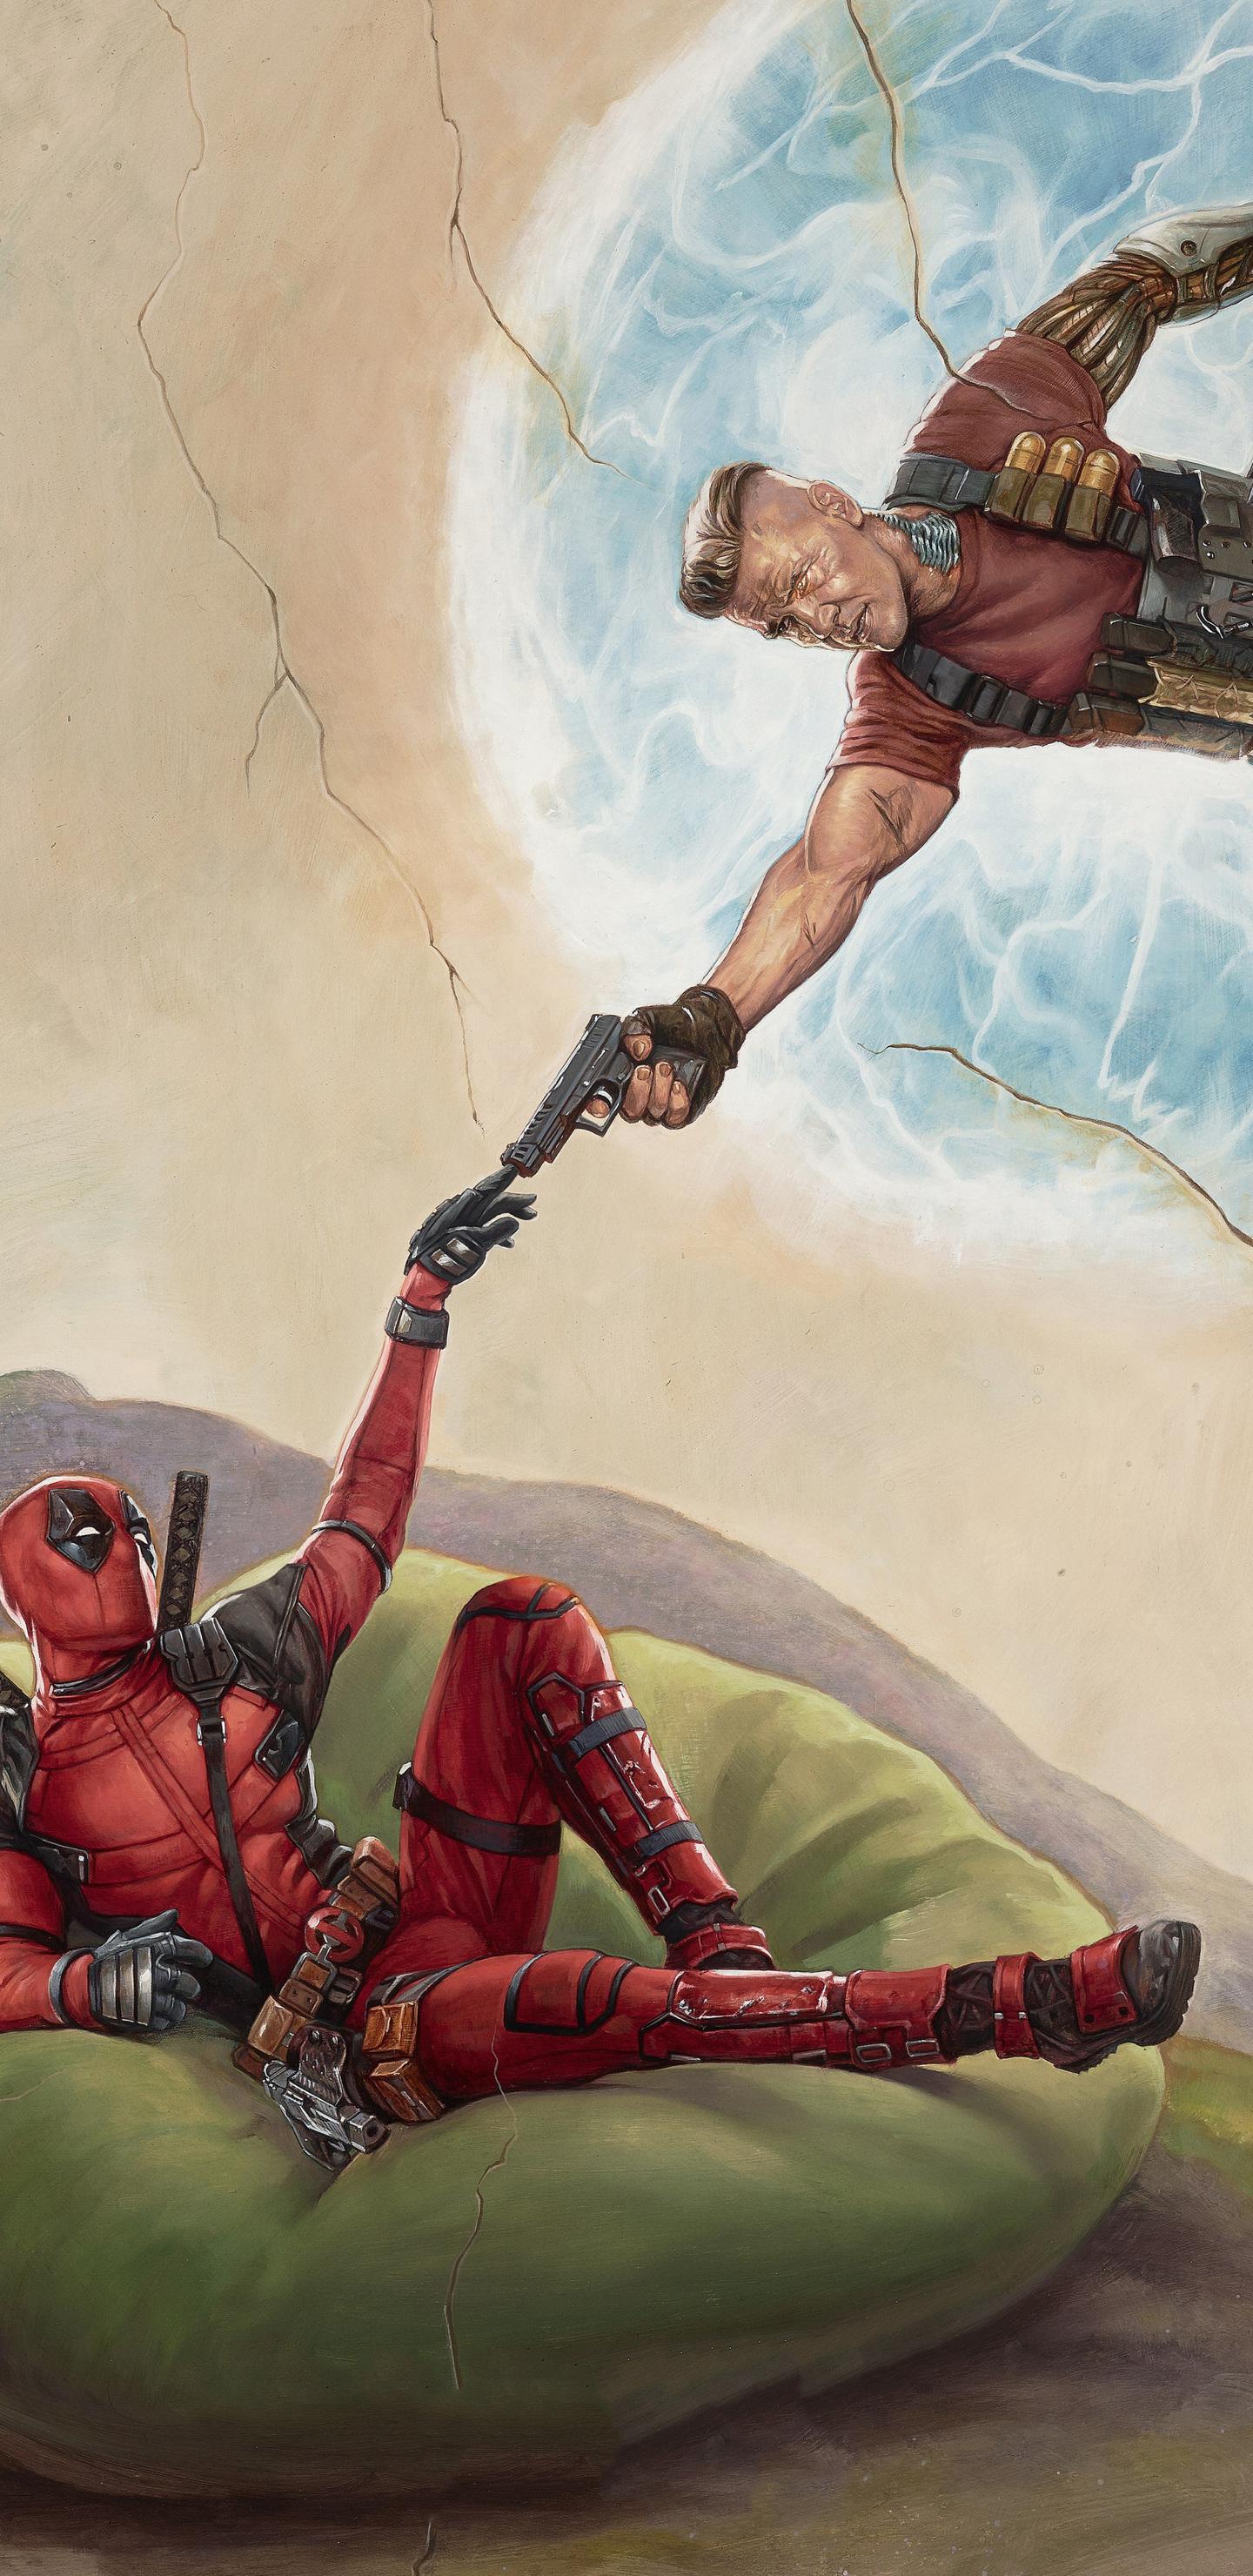 Deadpool 2 2018 Movie Poster (Samsung Galaxy Note 9,8, S9,S8,S8+ QHD)